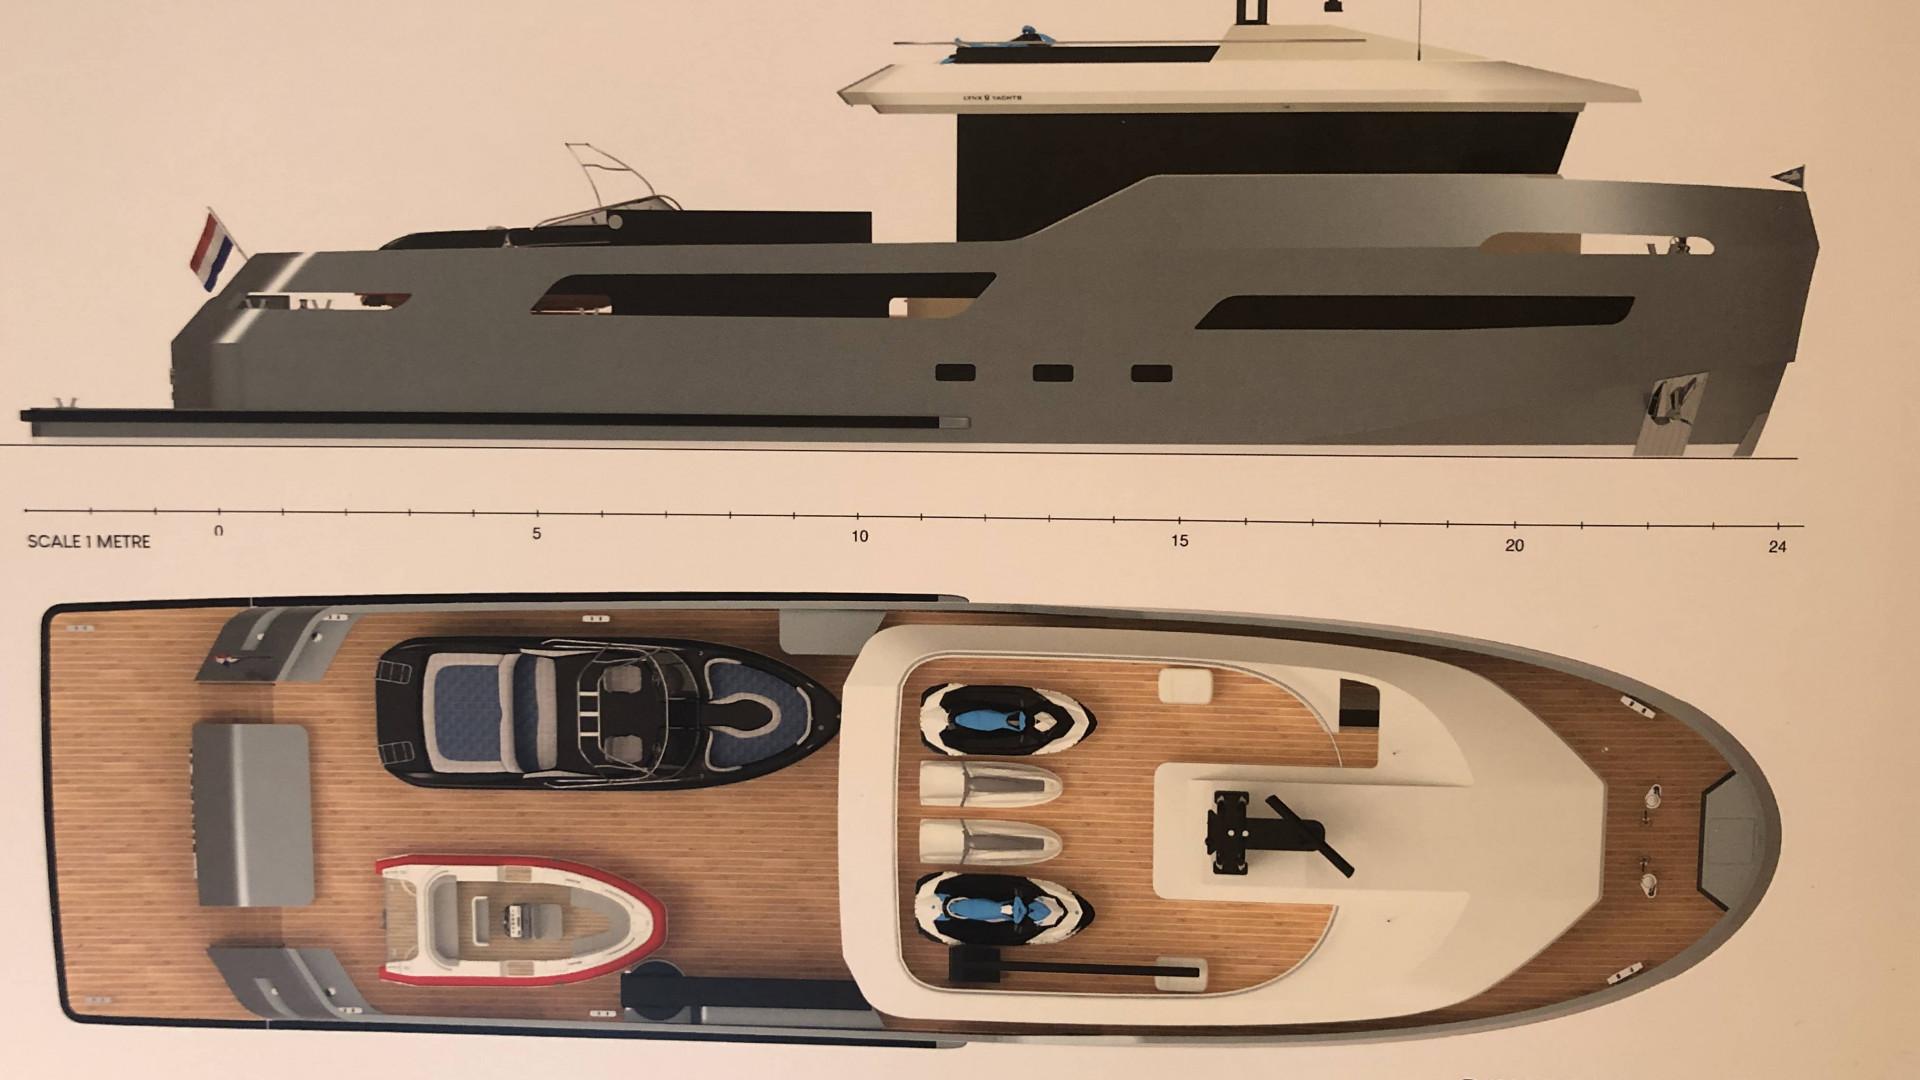 Flevojachtbouw Lynx crossover 27 image